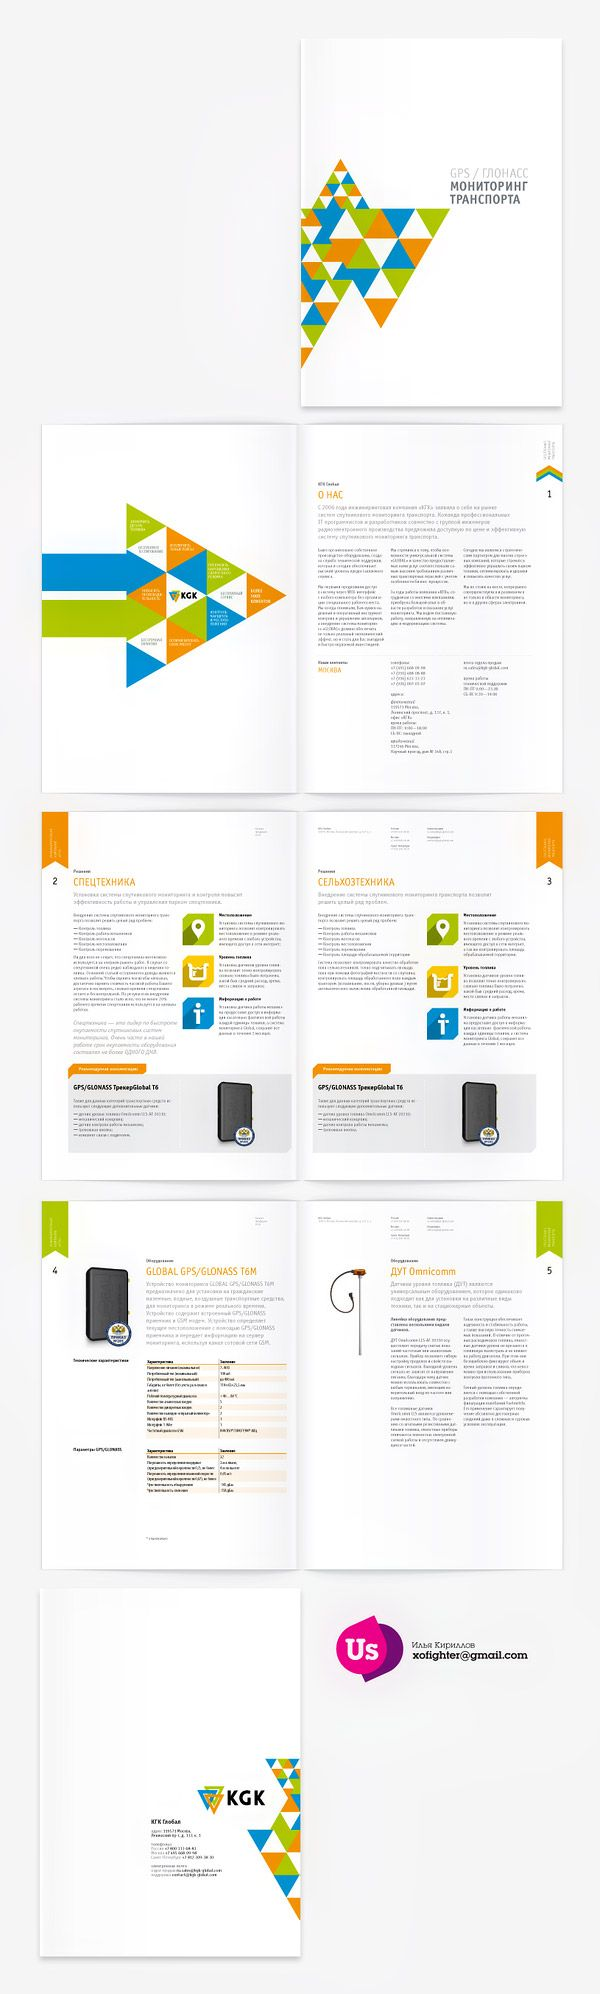 Дизайн каталога продукции компании «КГК» (Полиграфический дизайн) - фри-лансер Илья Кириллов [xenOnn].